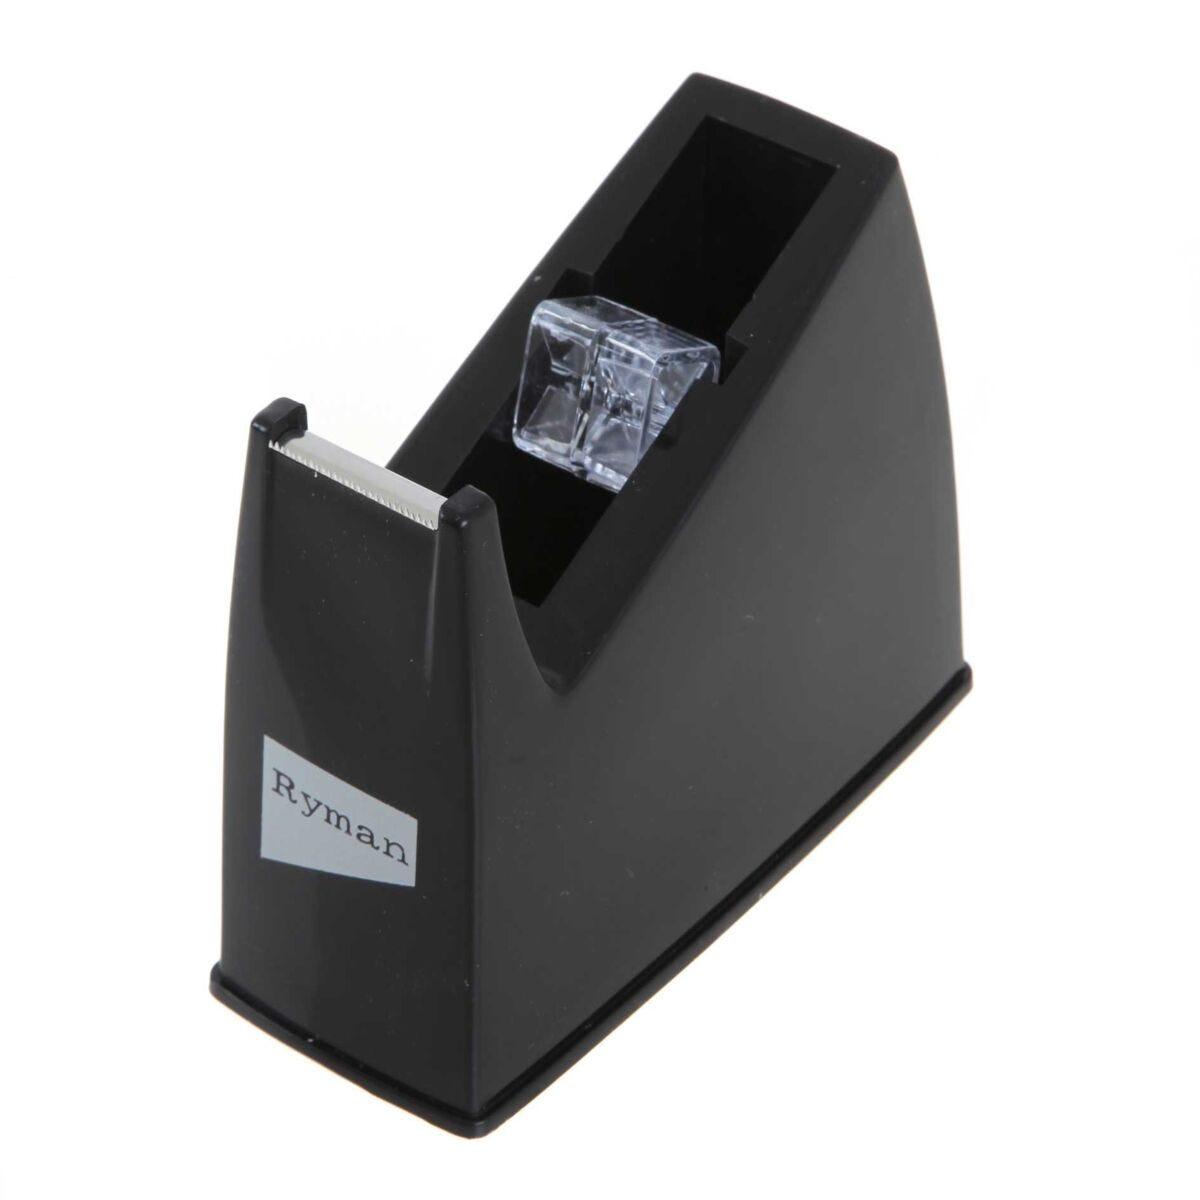 Ryman Tape Dispenser Medium Black